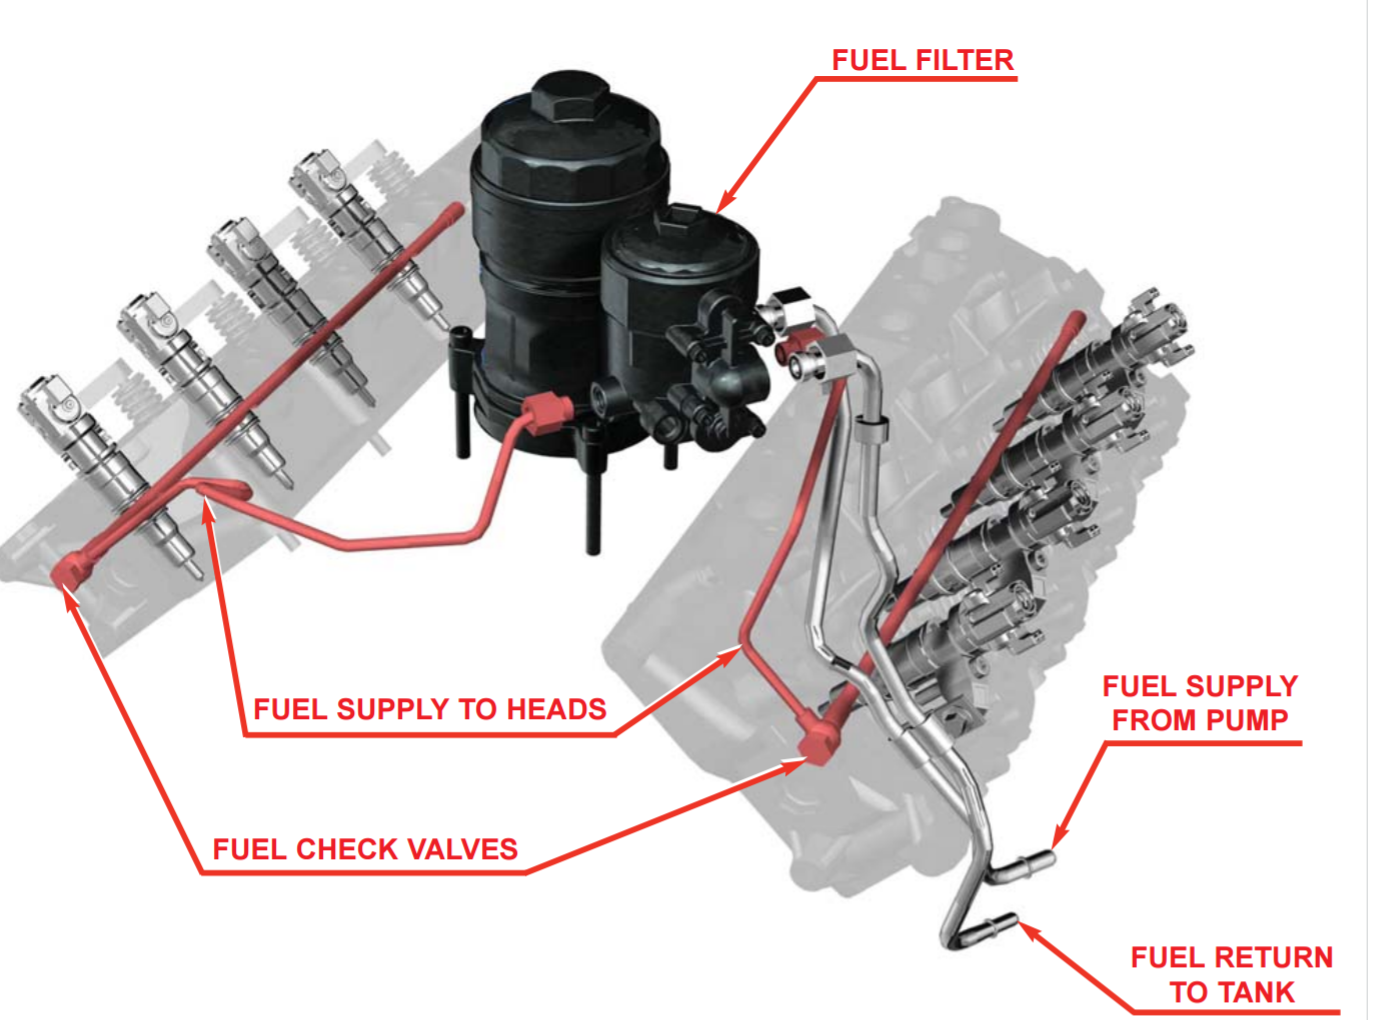 ss fuel lines  ending the dead head flow